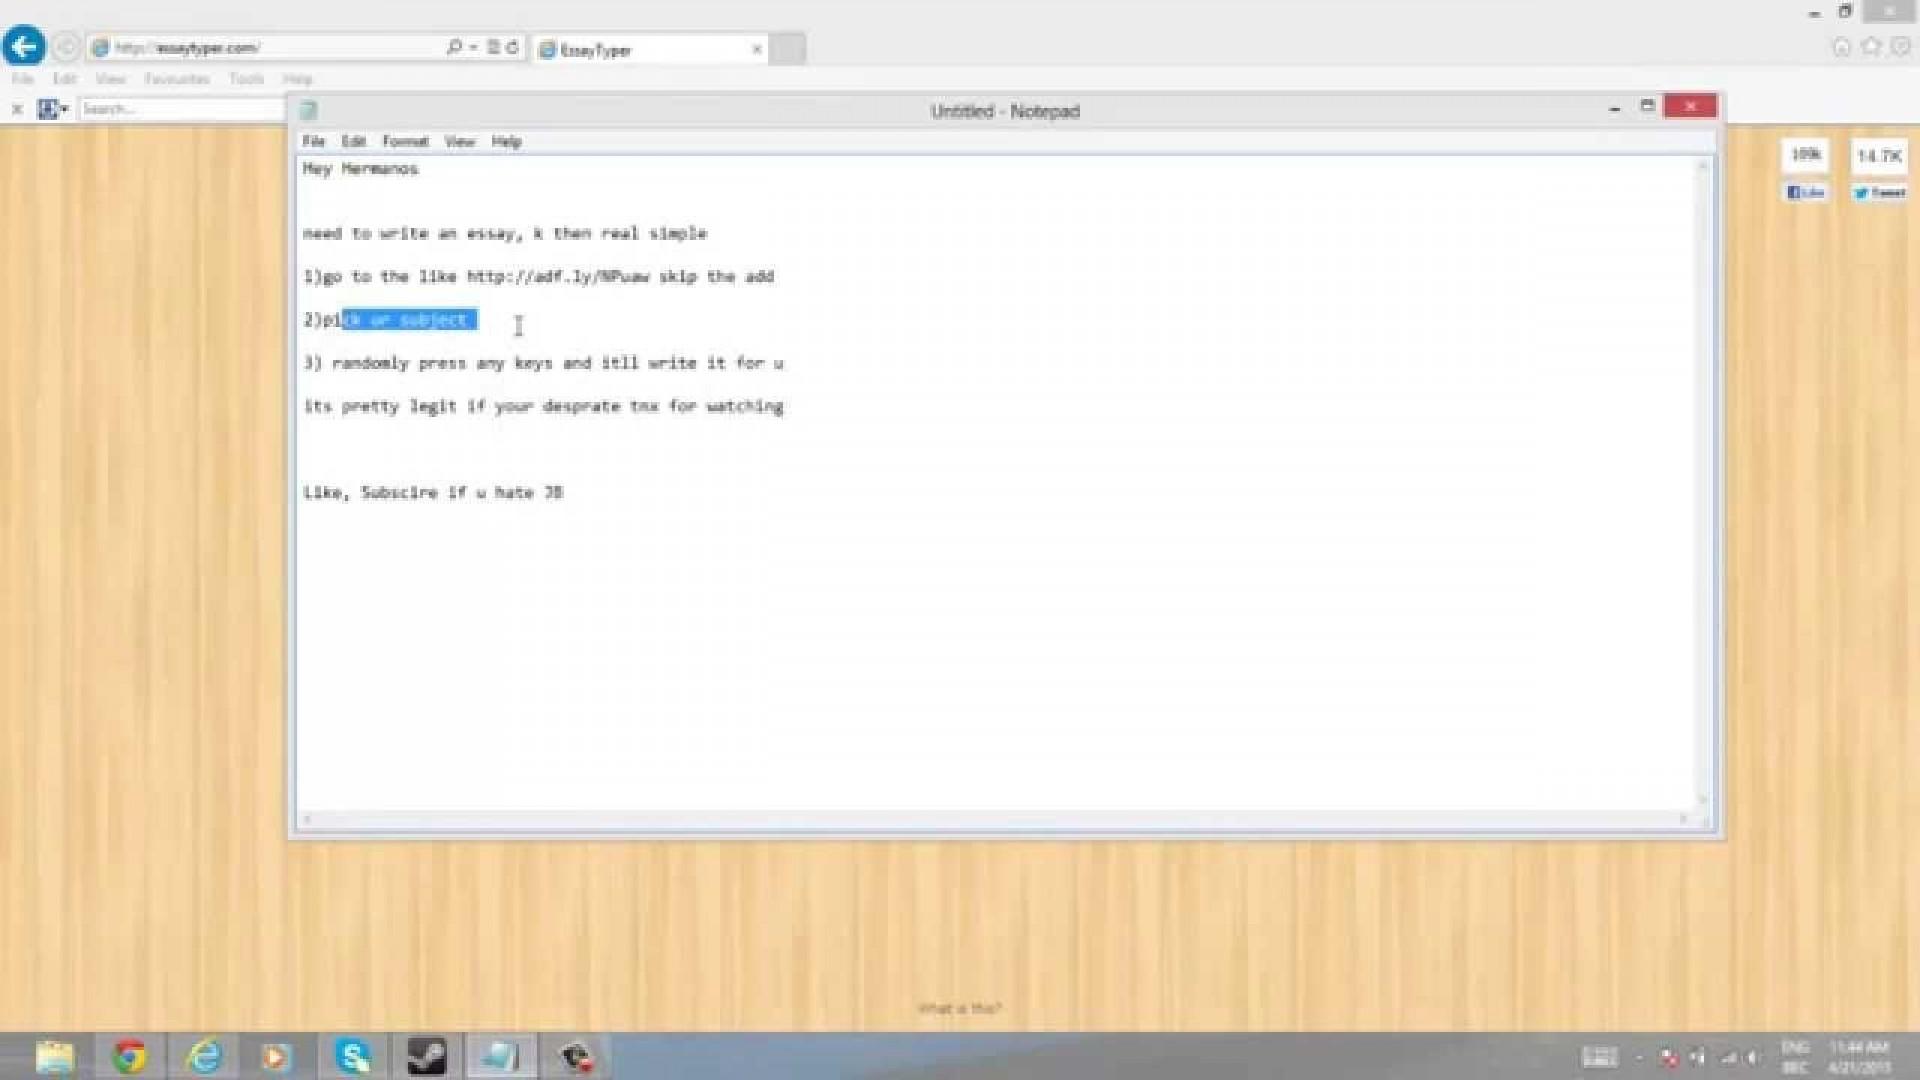 006 Maxresdefault Essay Example Typer Formidable Website 1920